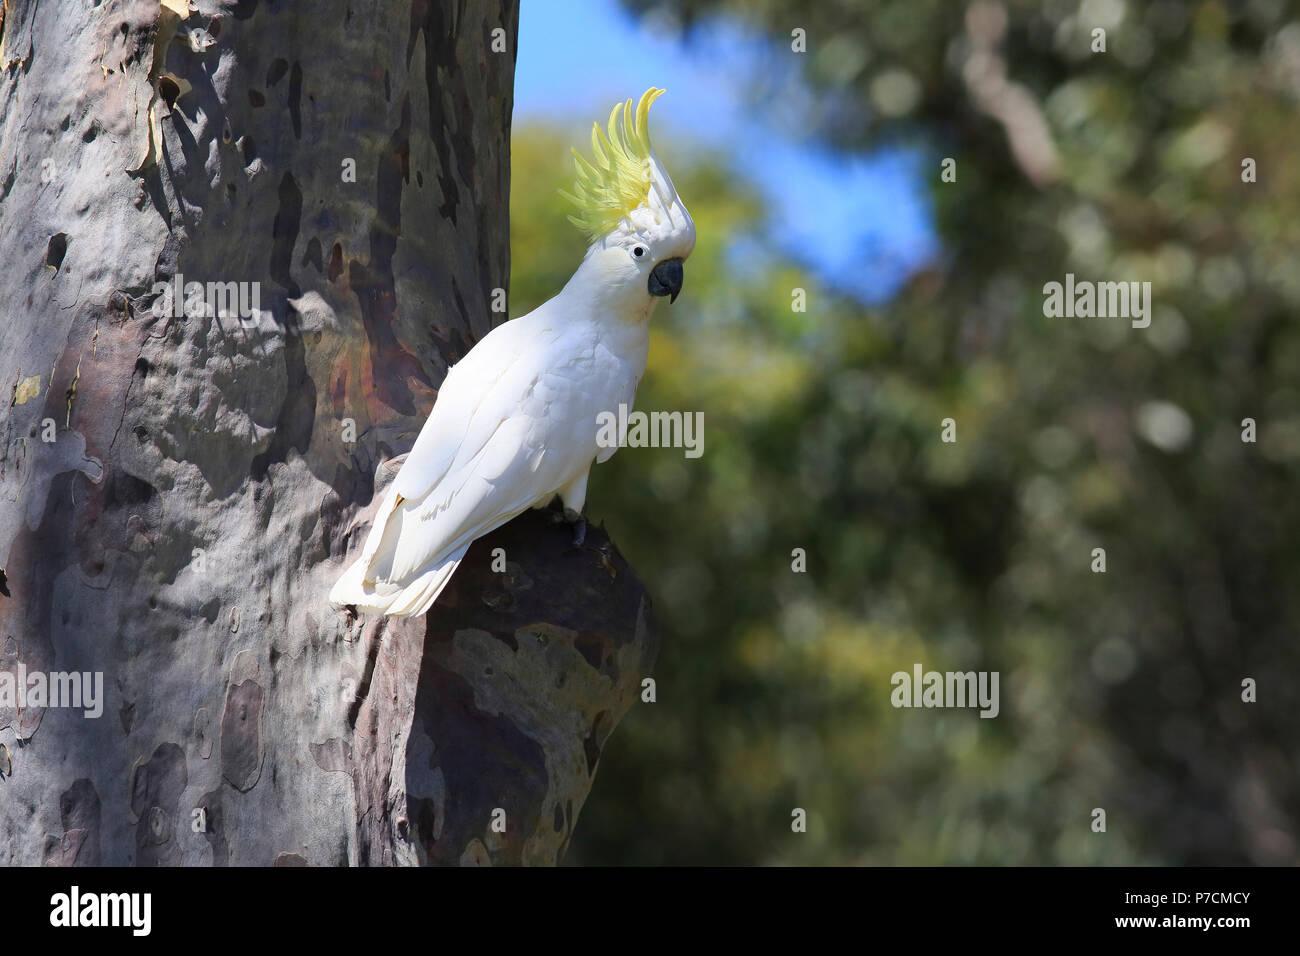 Sulfur-crested Cockatoo, adult on tree, Murramarang National Park, South Australia, Australia, (Cacatua galerita) - Stock Image